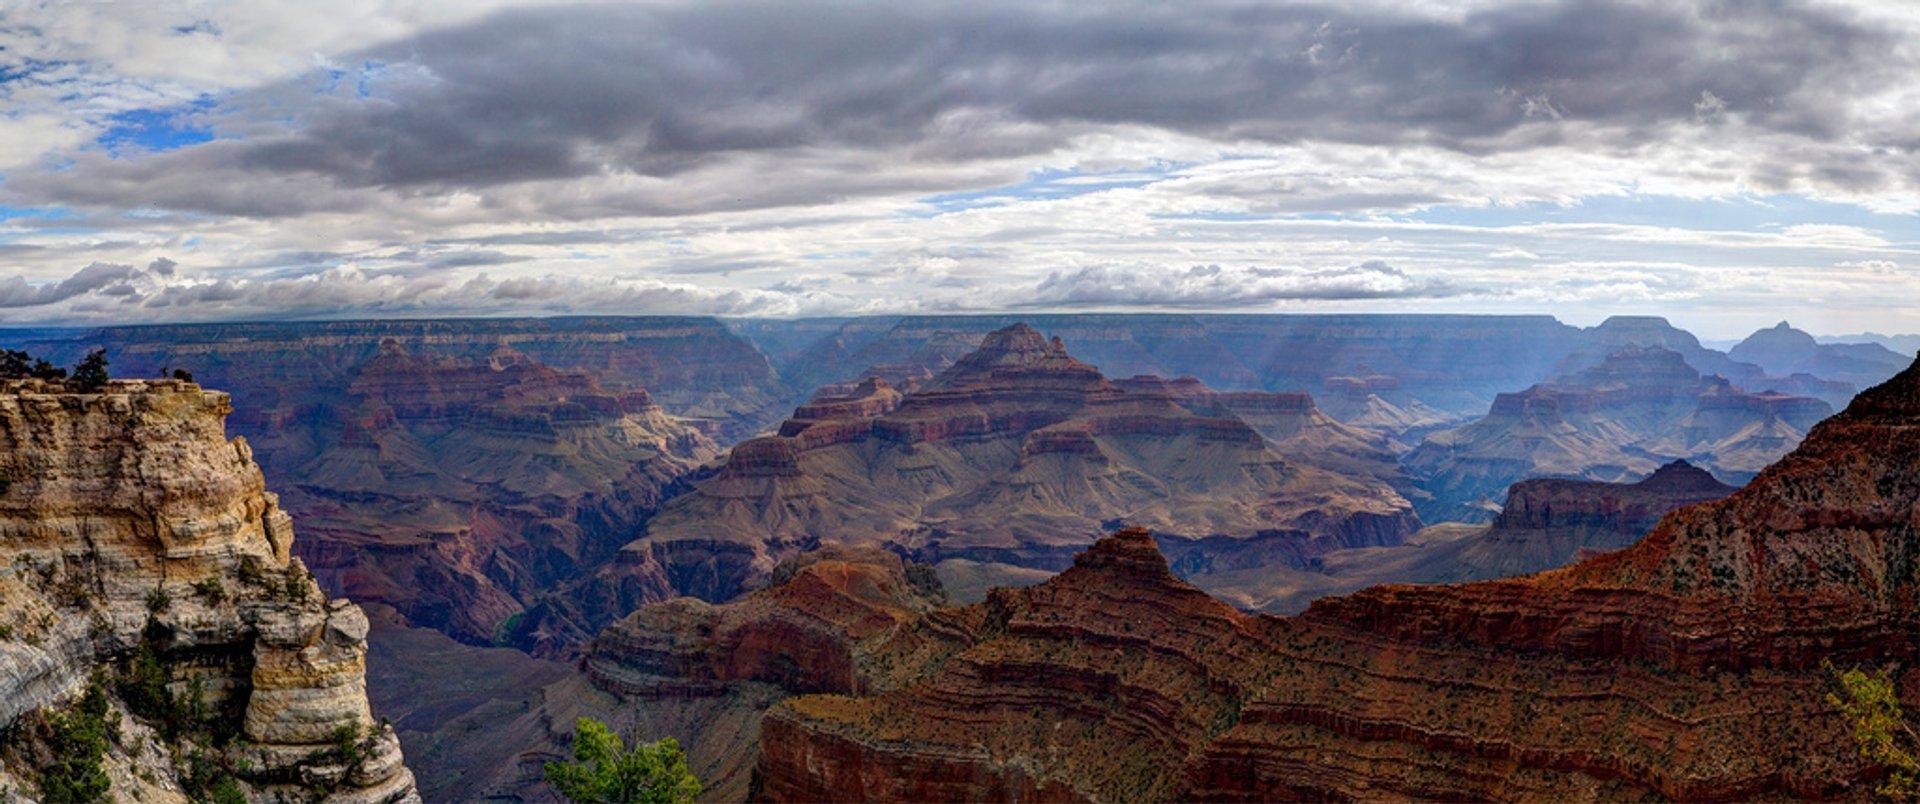 Monsoon Season in Grand Canyon - Best Season 2020